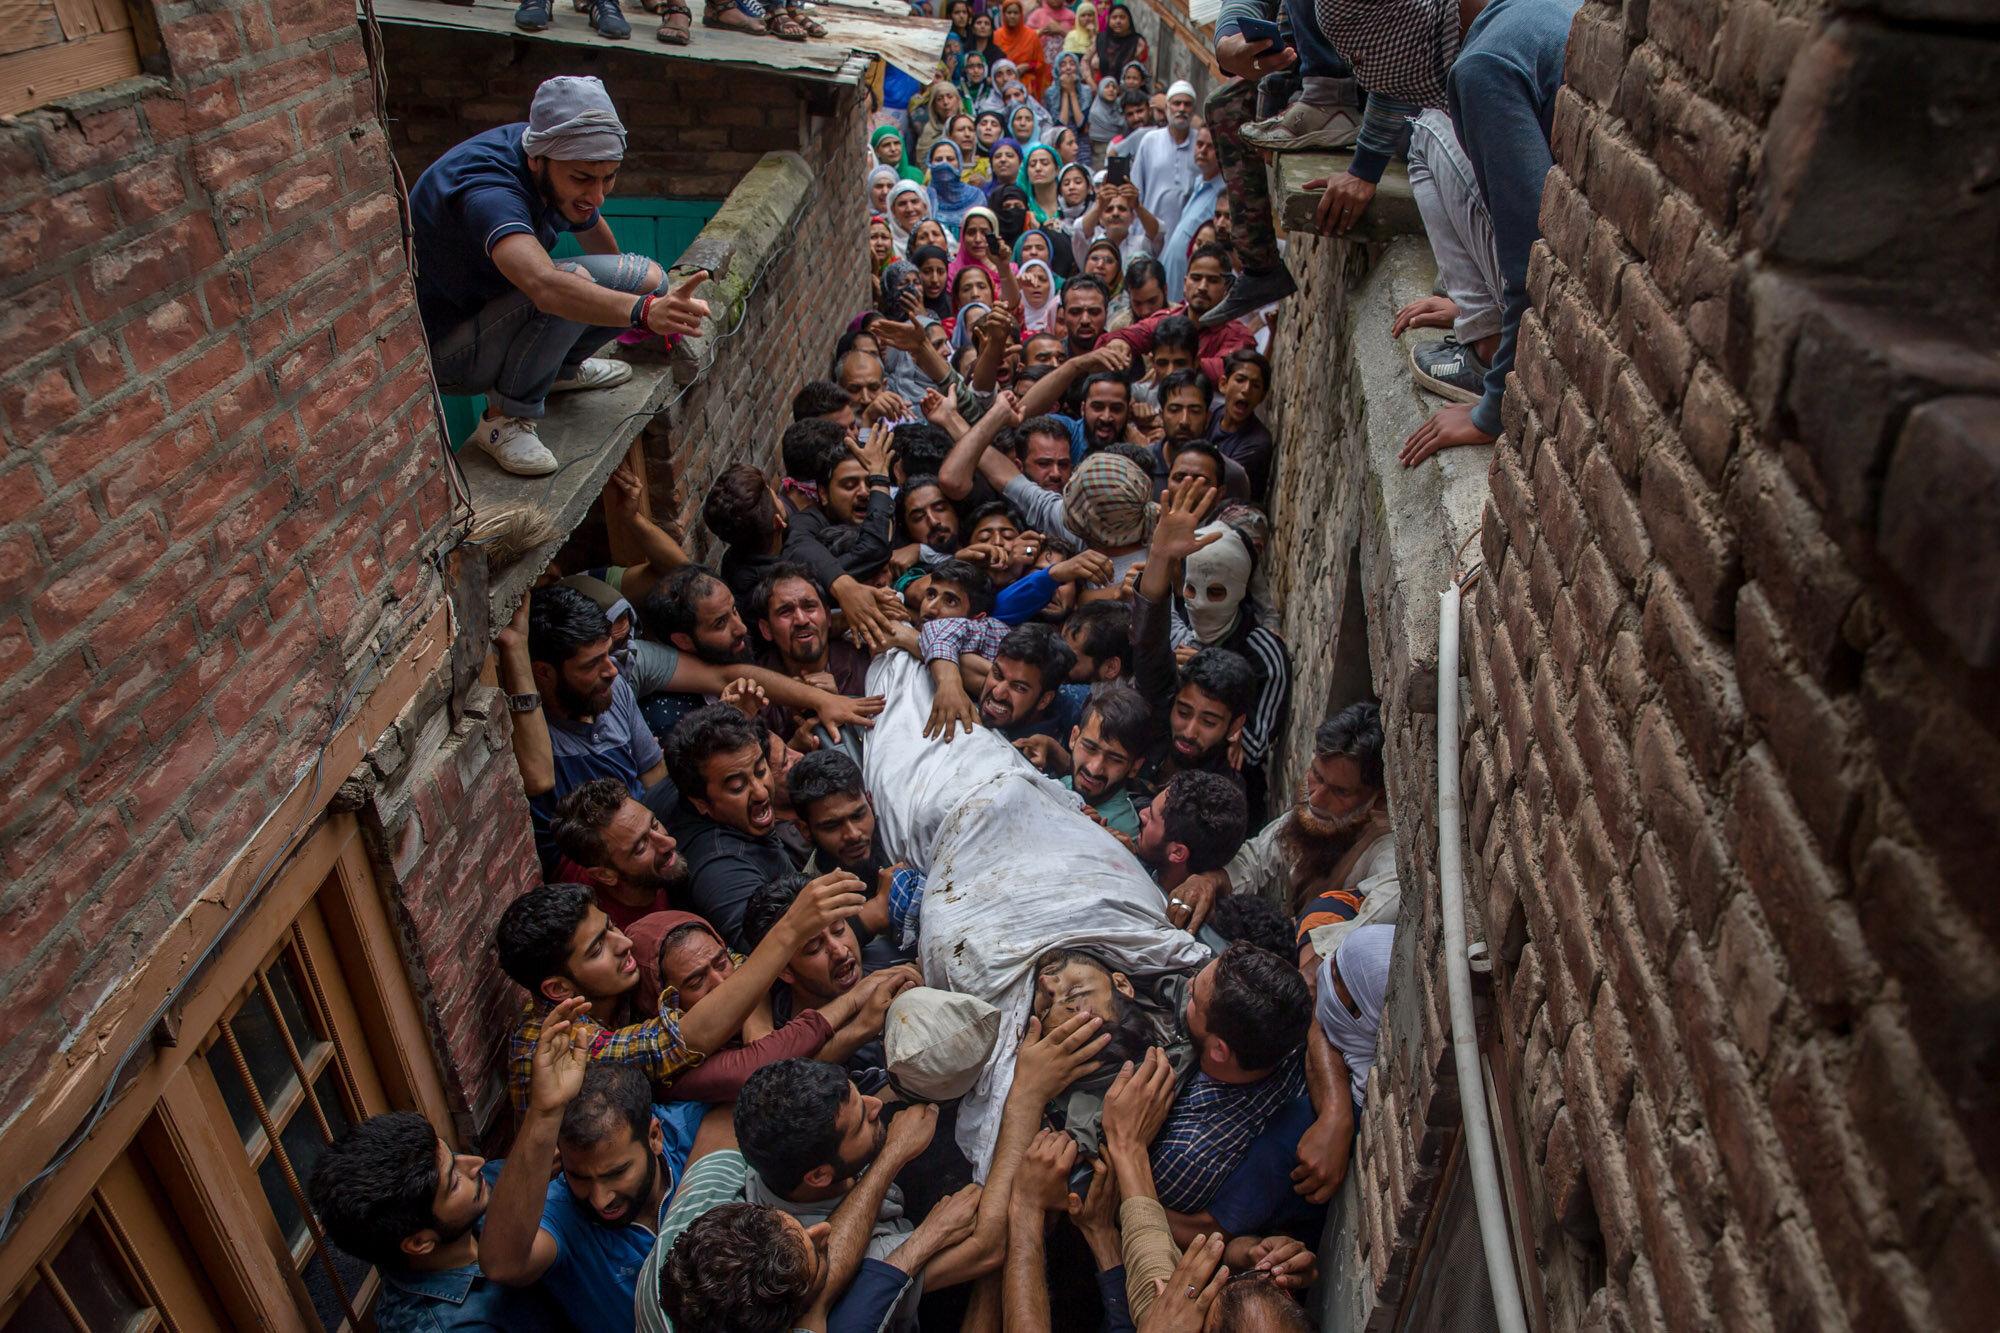 Kashmiri men shout pro-freedom slogans as they carry body of a local rebel Sajad Ahmed Gilkar, during his funeral in Srinagar, Indian controlled Kashmir, July 12, 2017. (AP Photo/Dar Yasin)